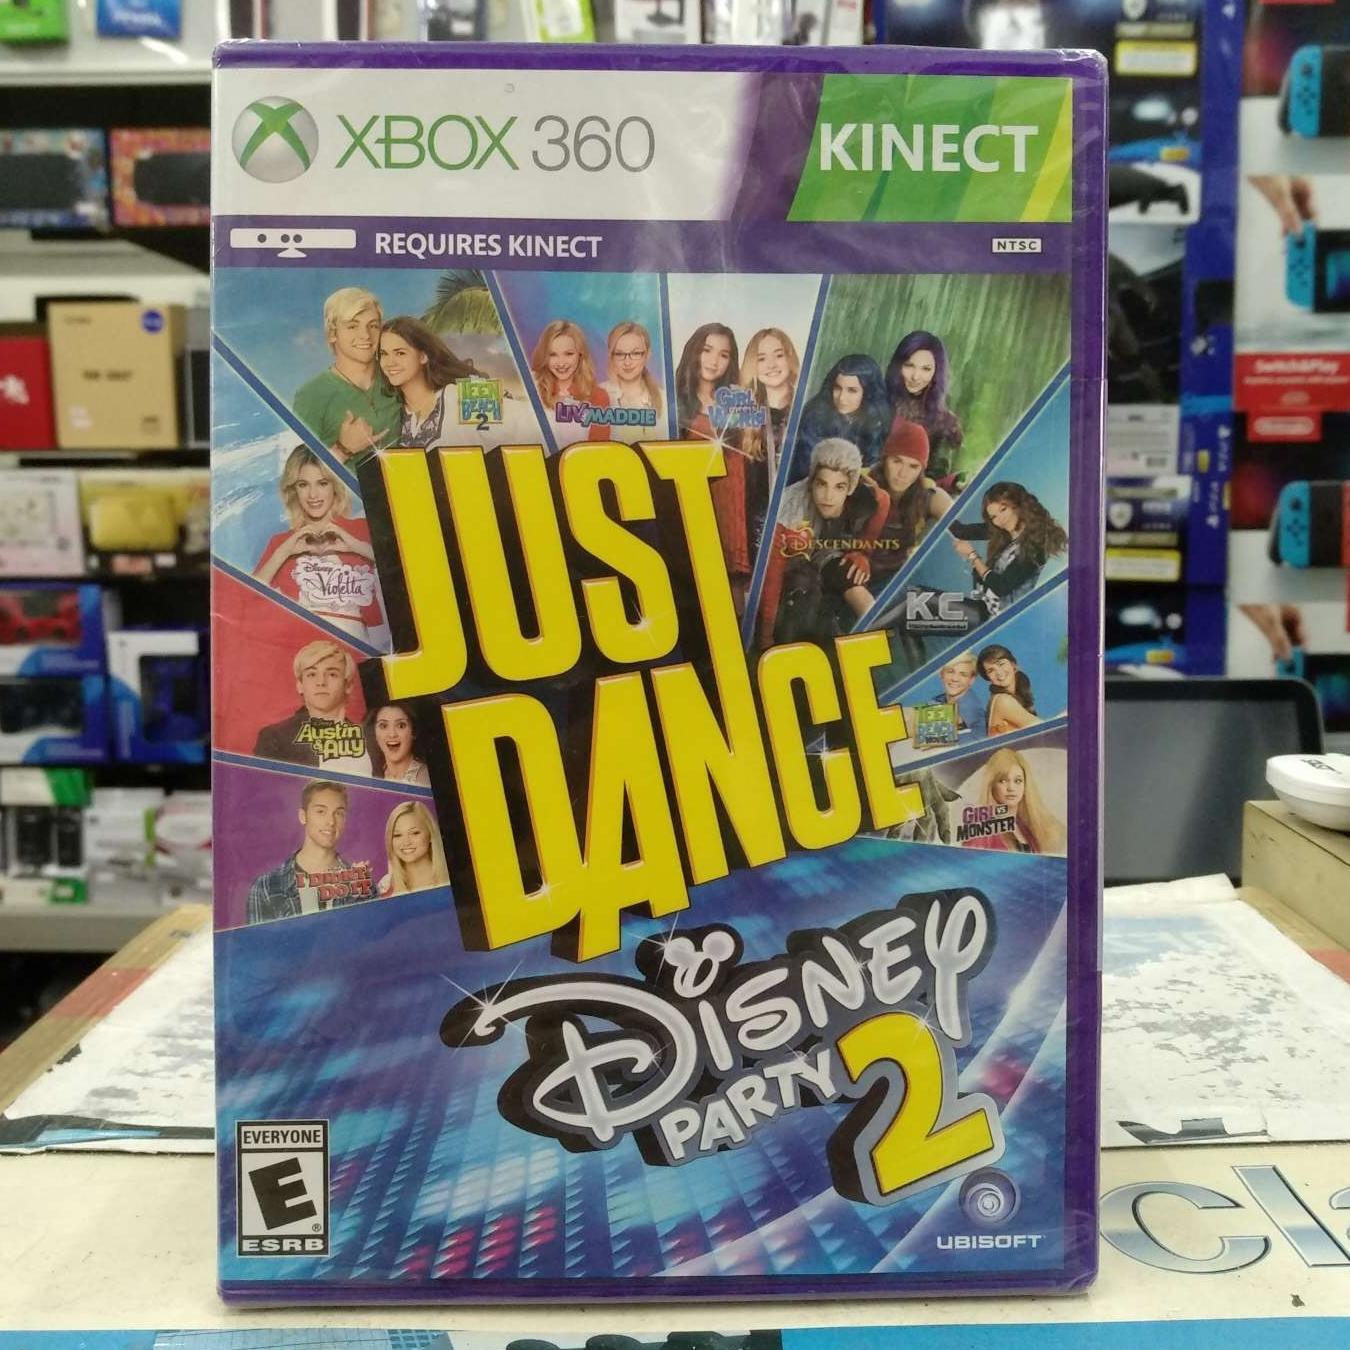 Xbox 360 Just Dance Disney Party 2